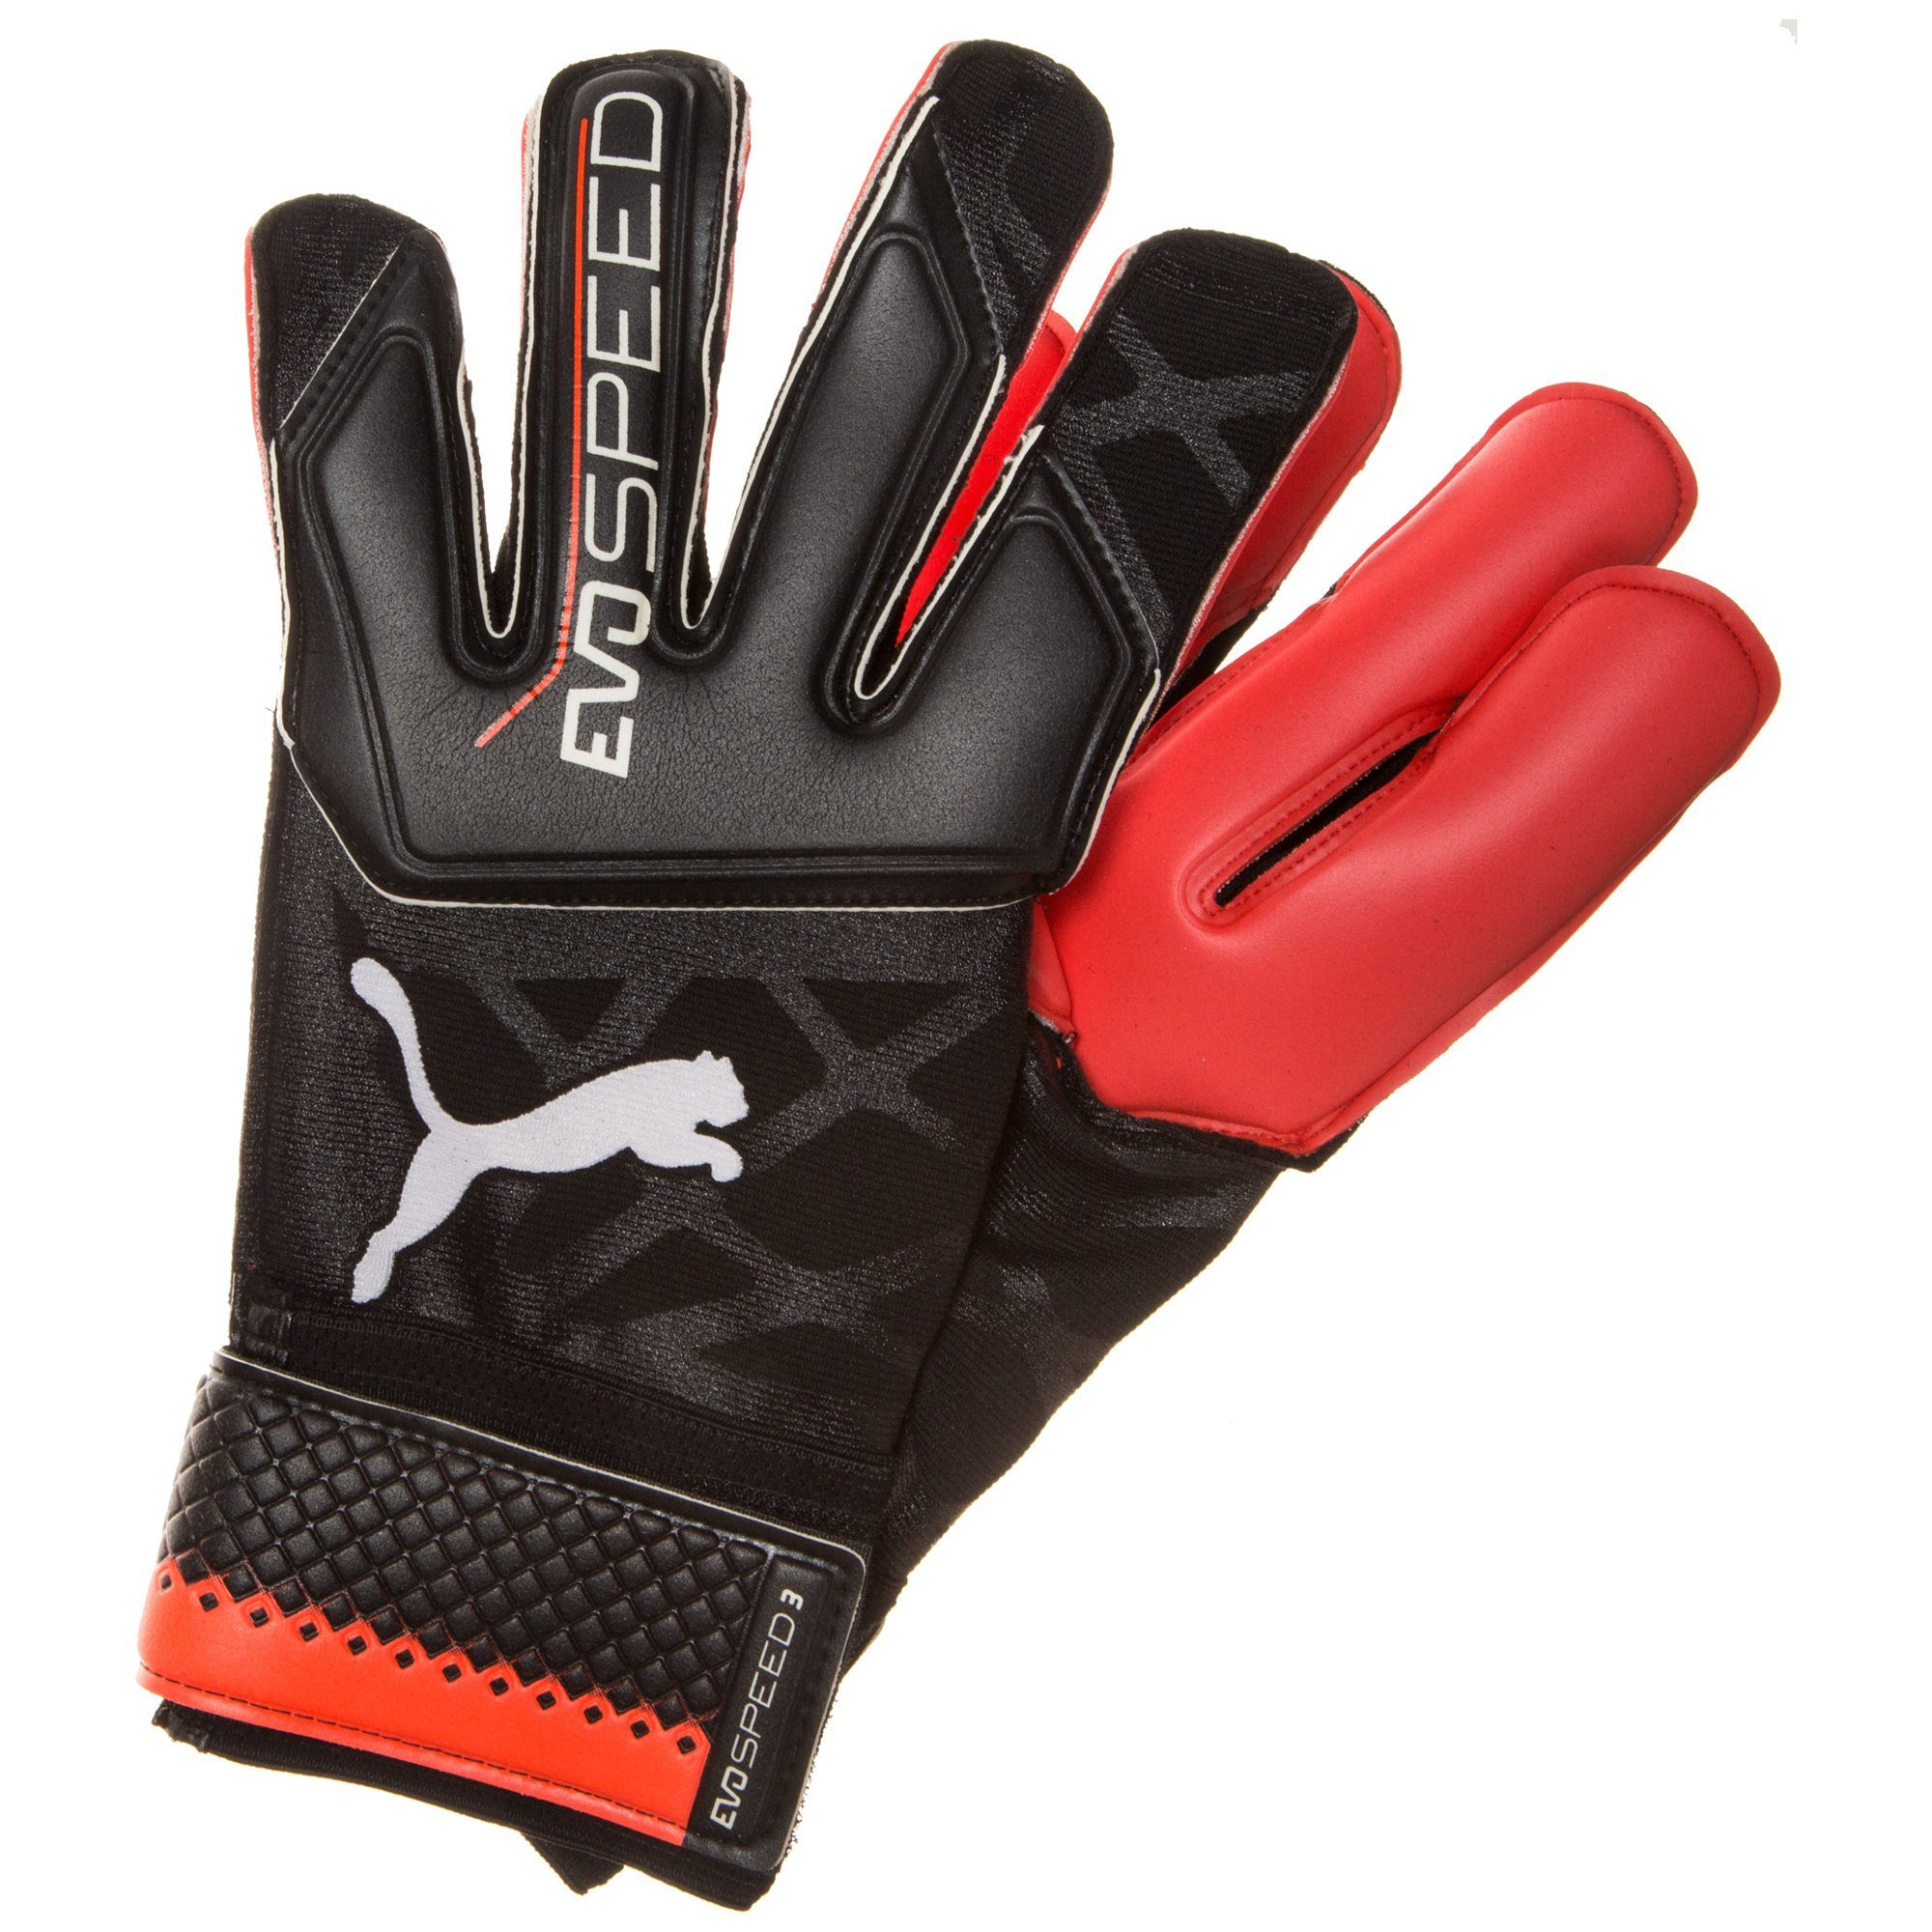 PUMA Torwarthandschuhe Evospeed 35 | Accessoires > Handschuhe | Puma